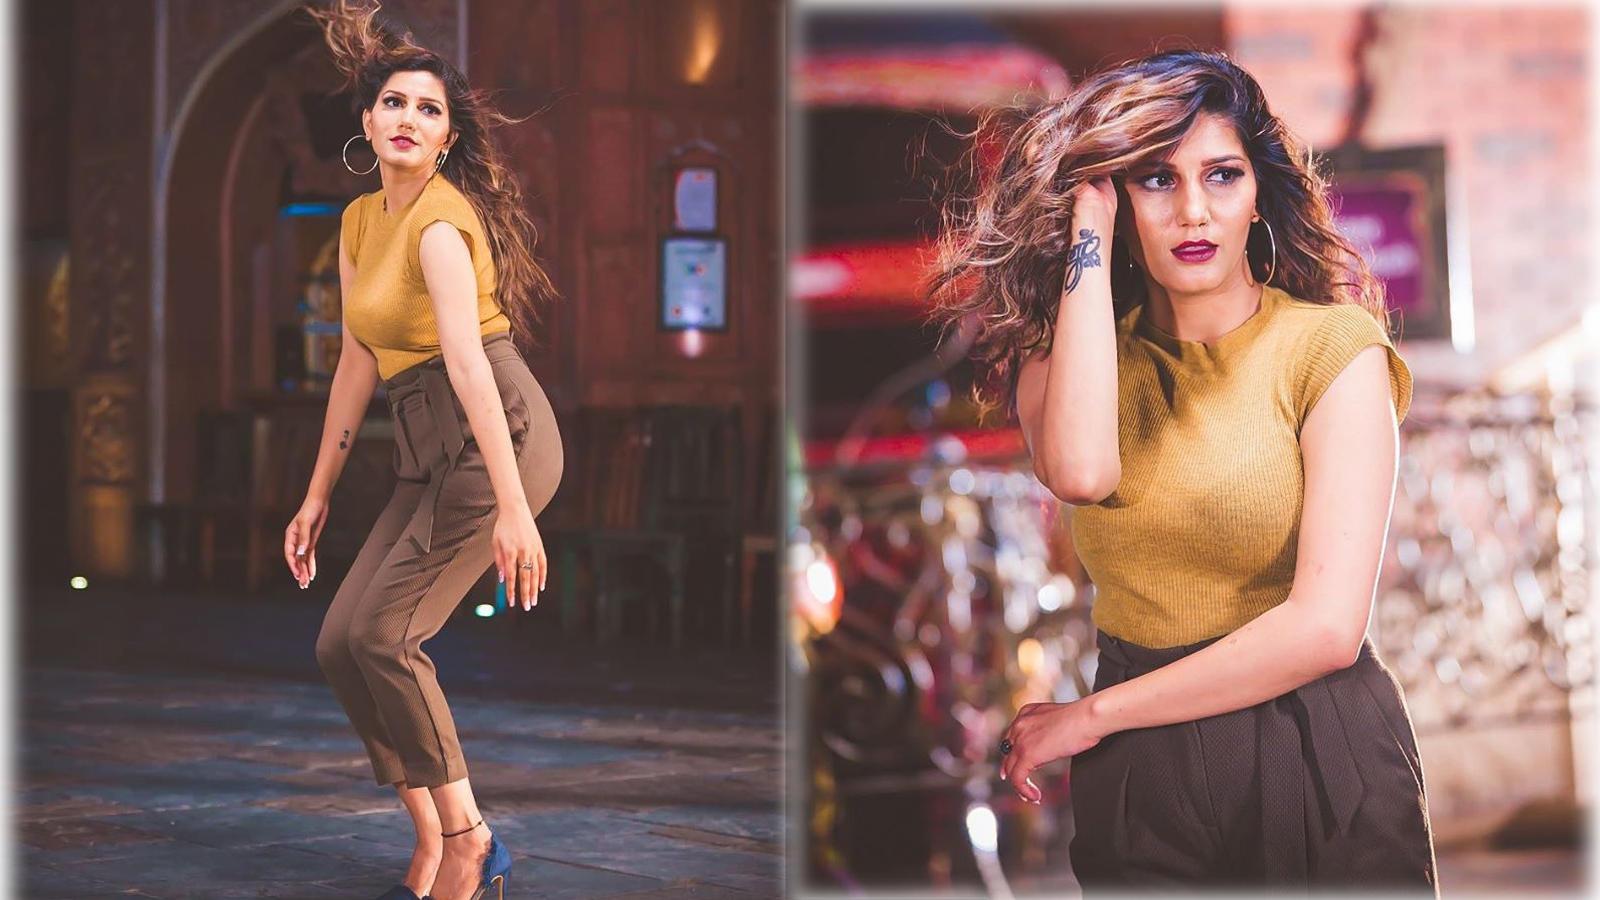 haryanvi-sensation-sapna-choudhary-ditches-her-desi-avatar-looks-super-glamorous-in-this-latest-photoshoot